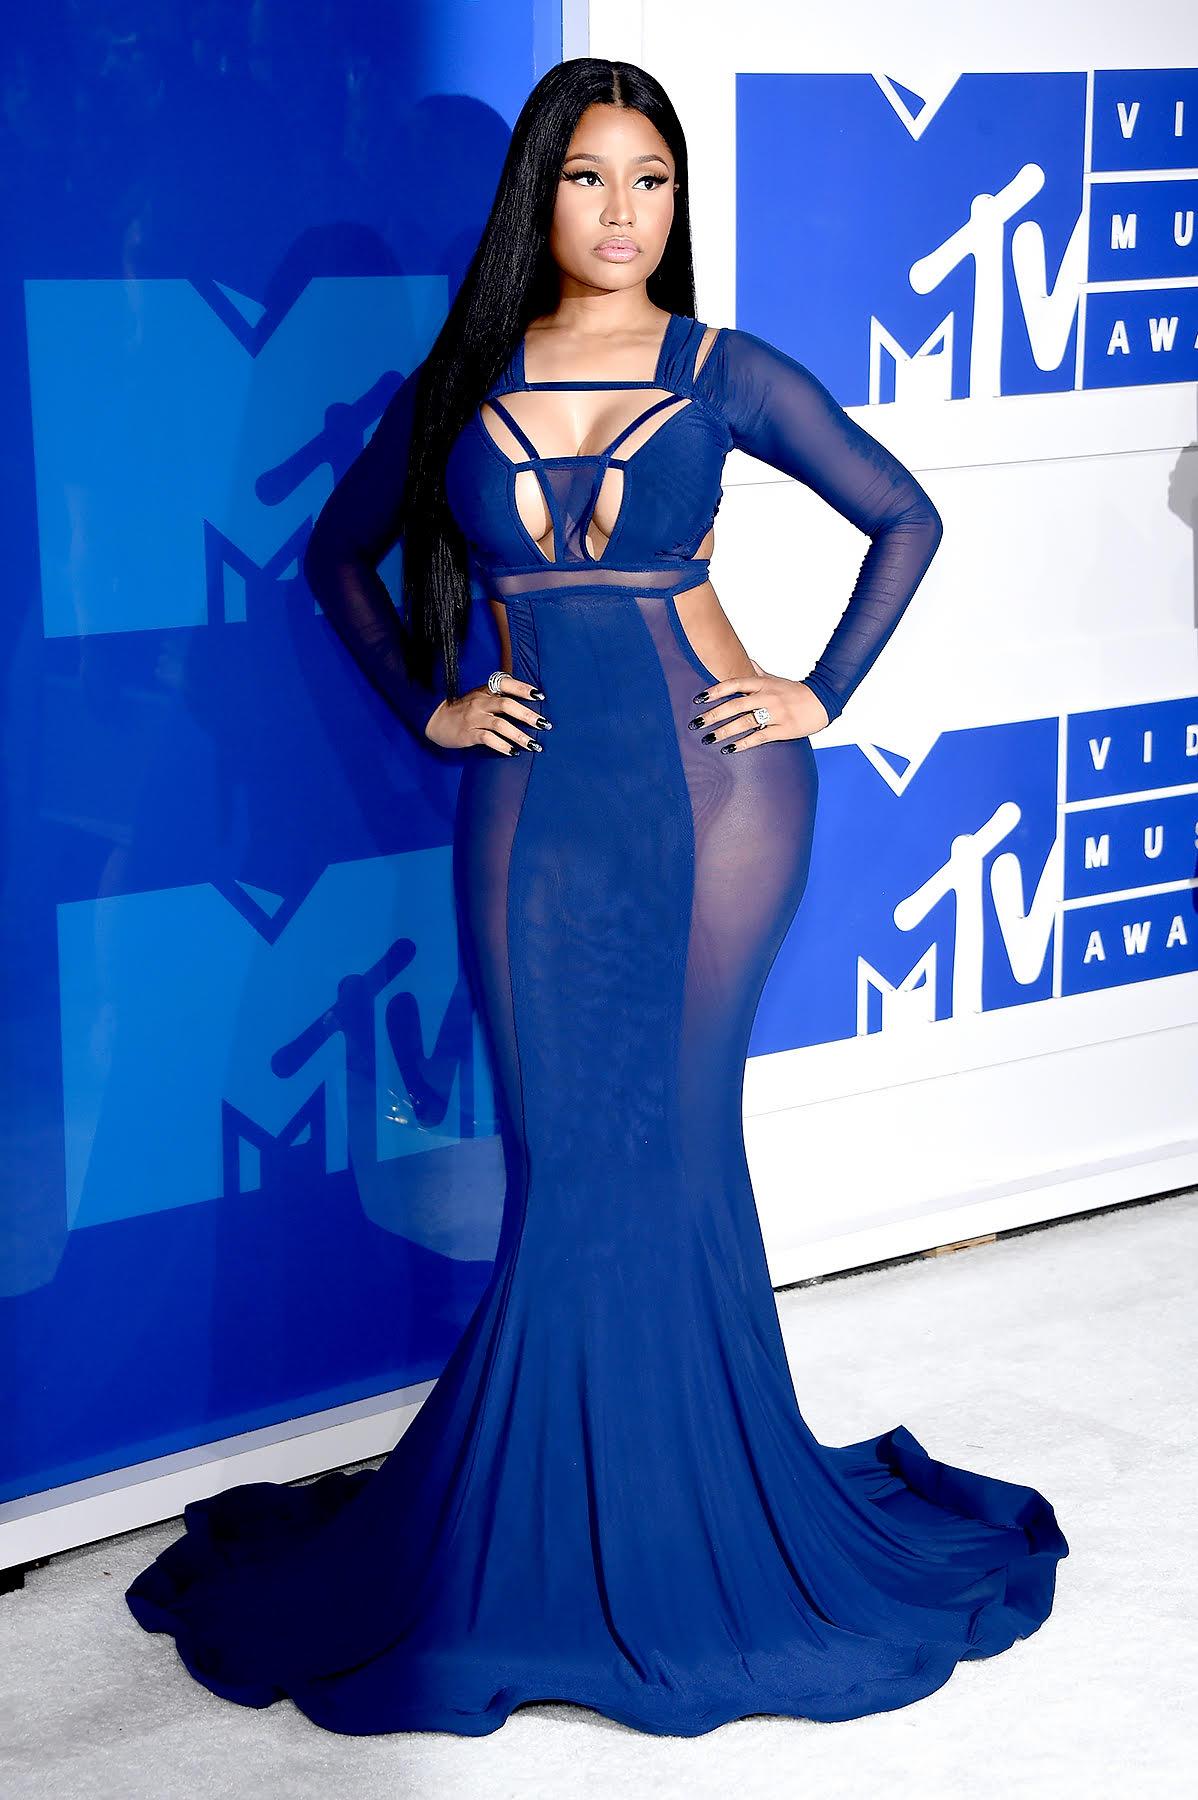 Sincere-Nicki Minaj.jpg